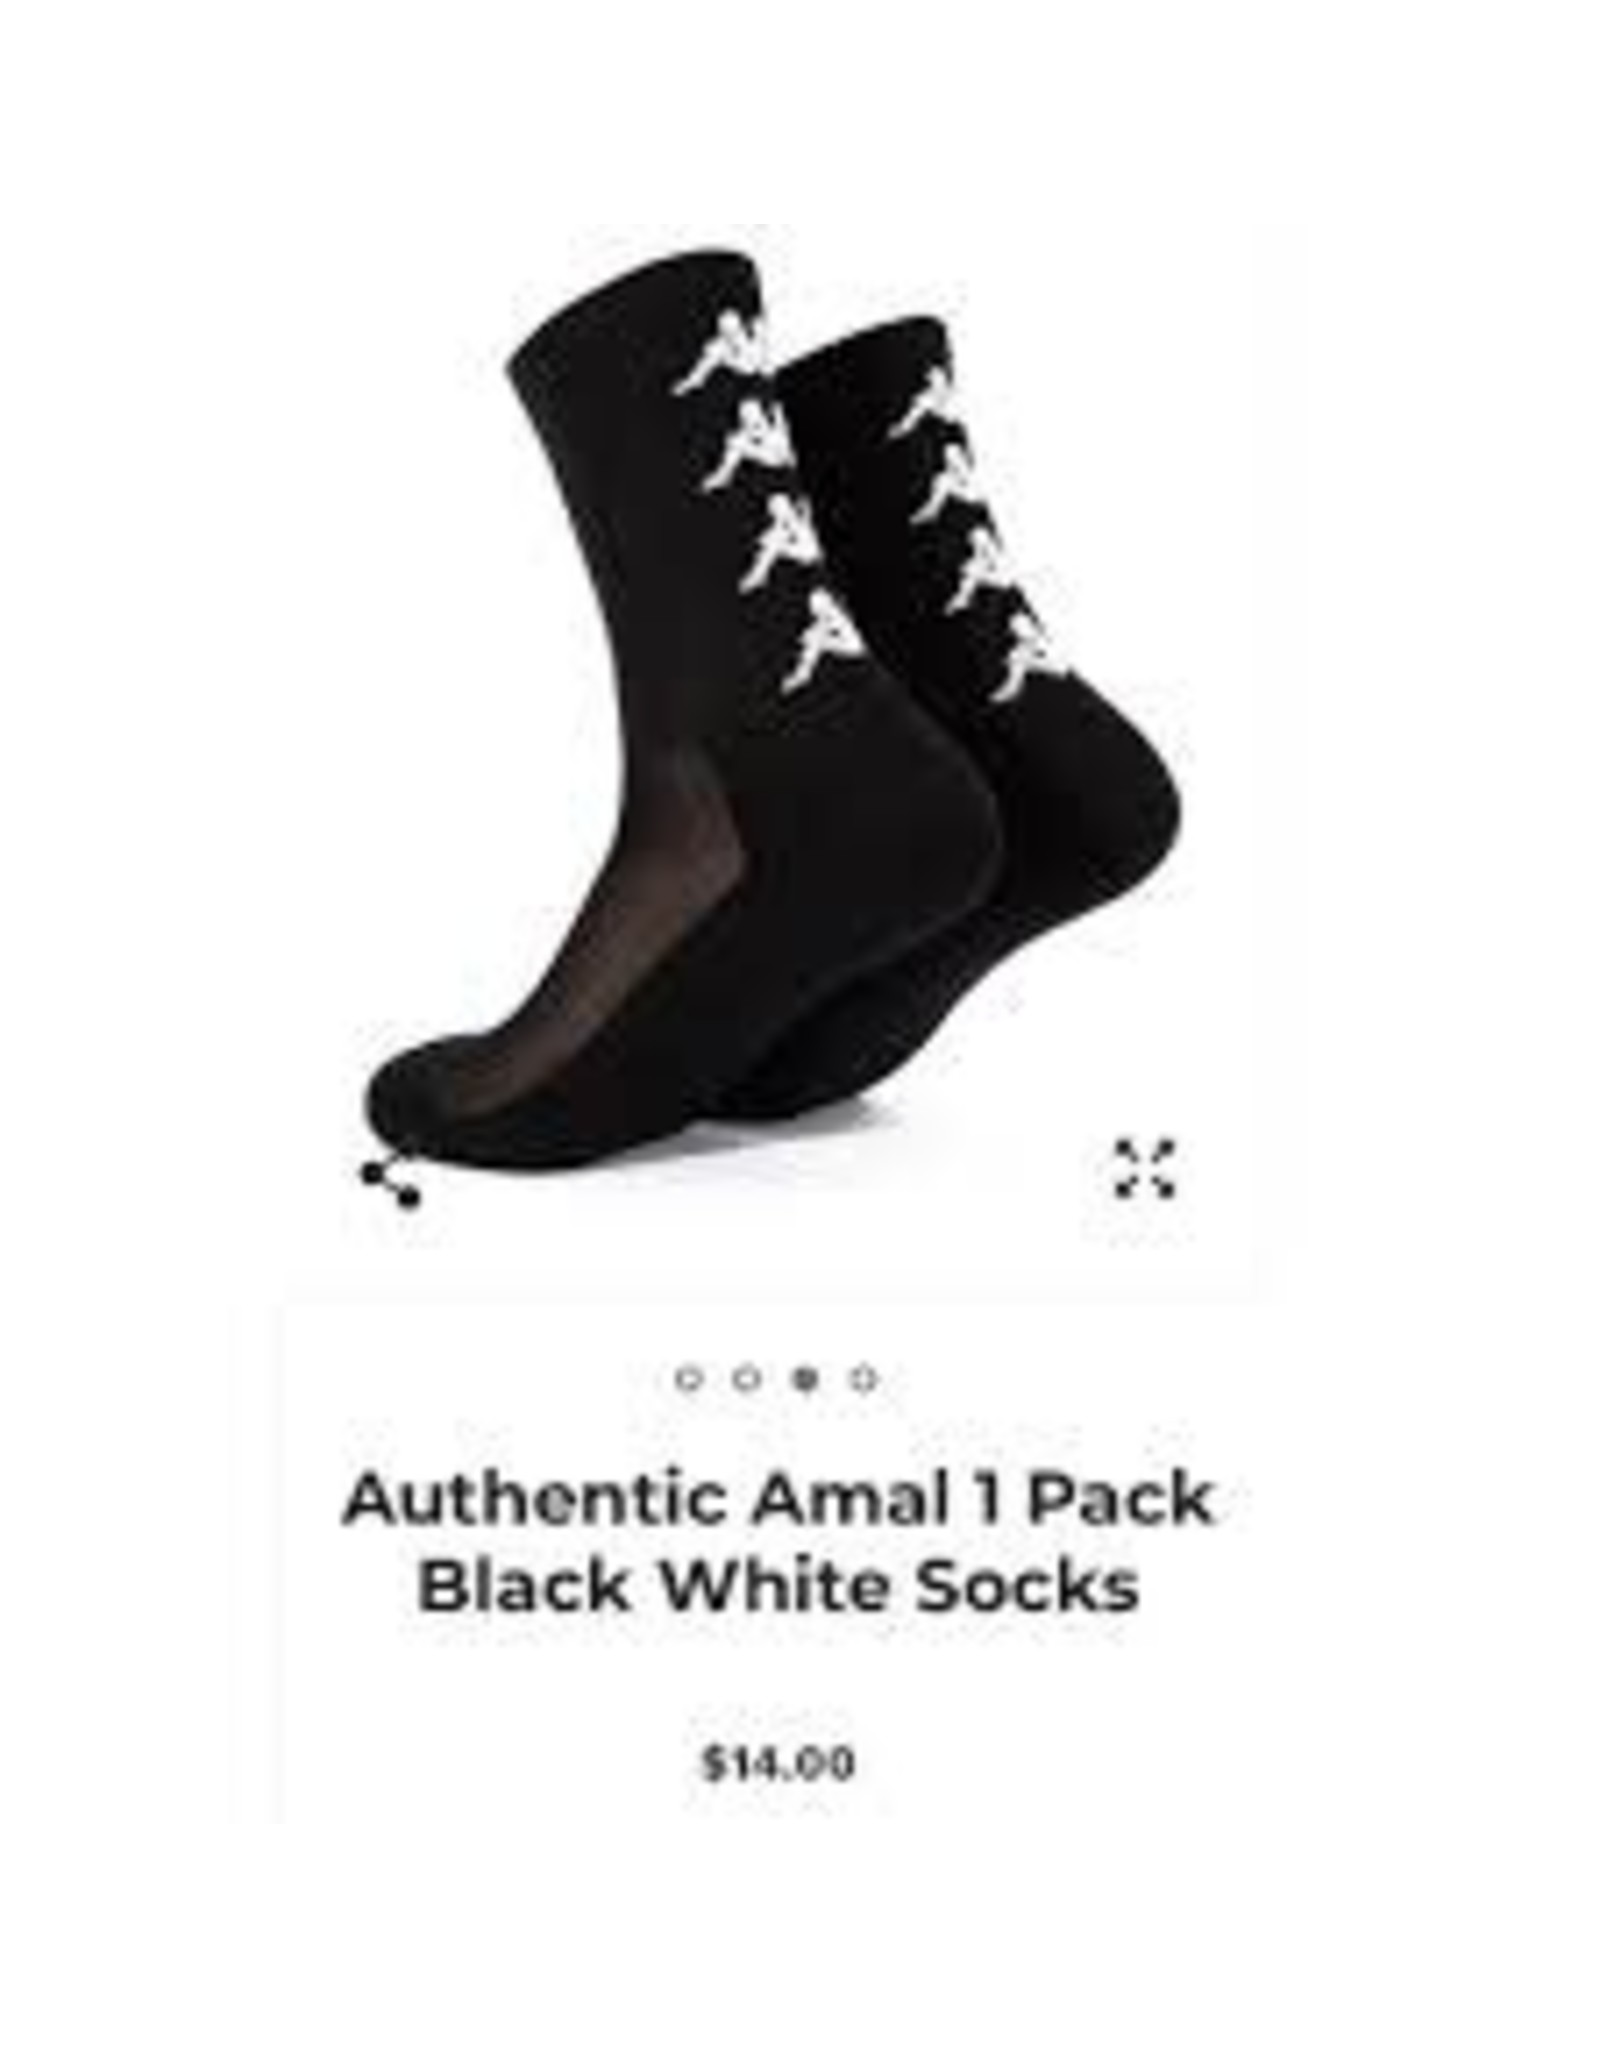 AUTHENTIC AMAL 1 PACK BLACK-WHITE